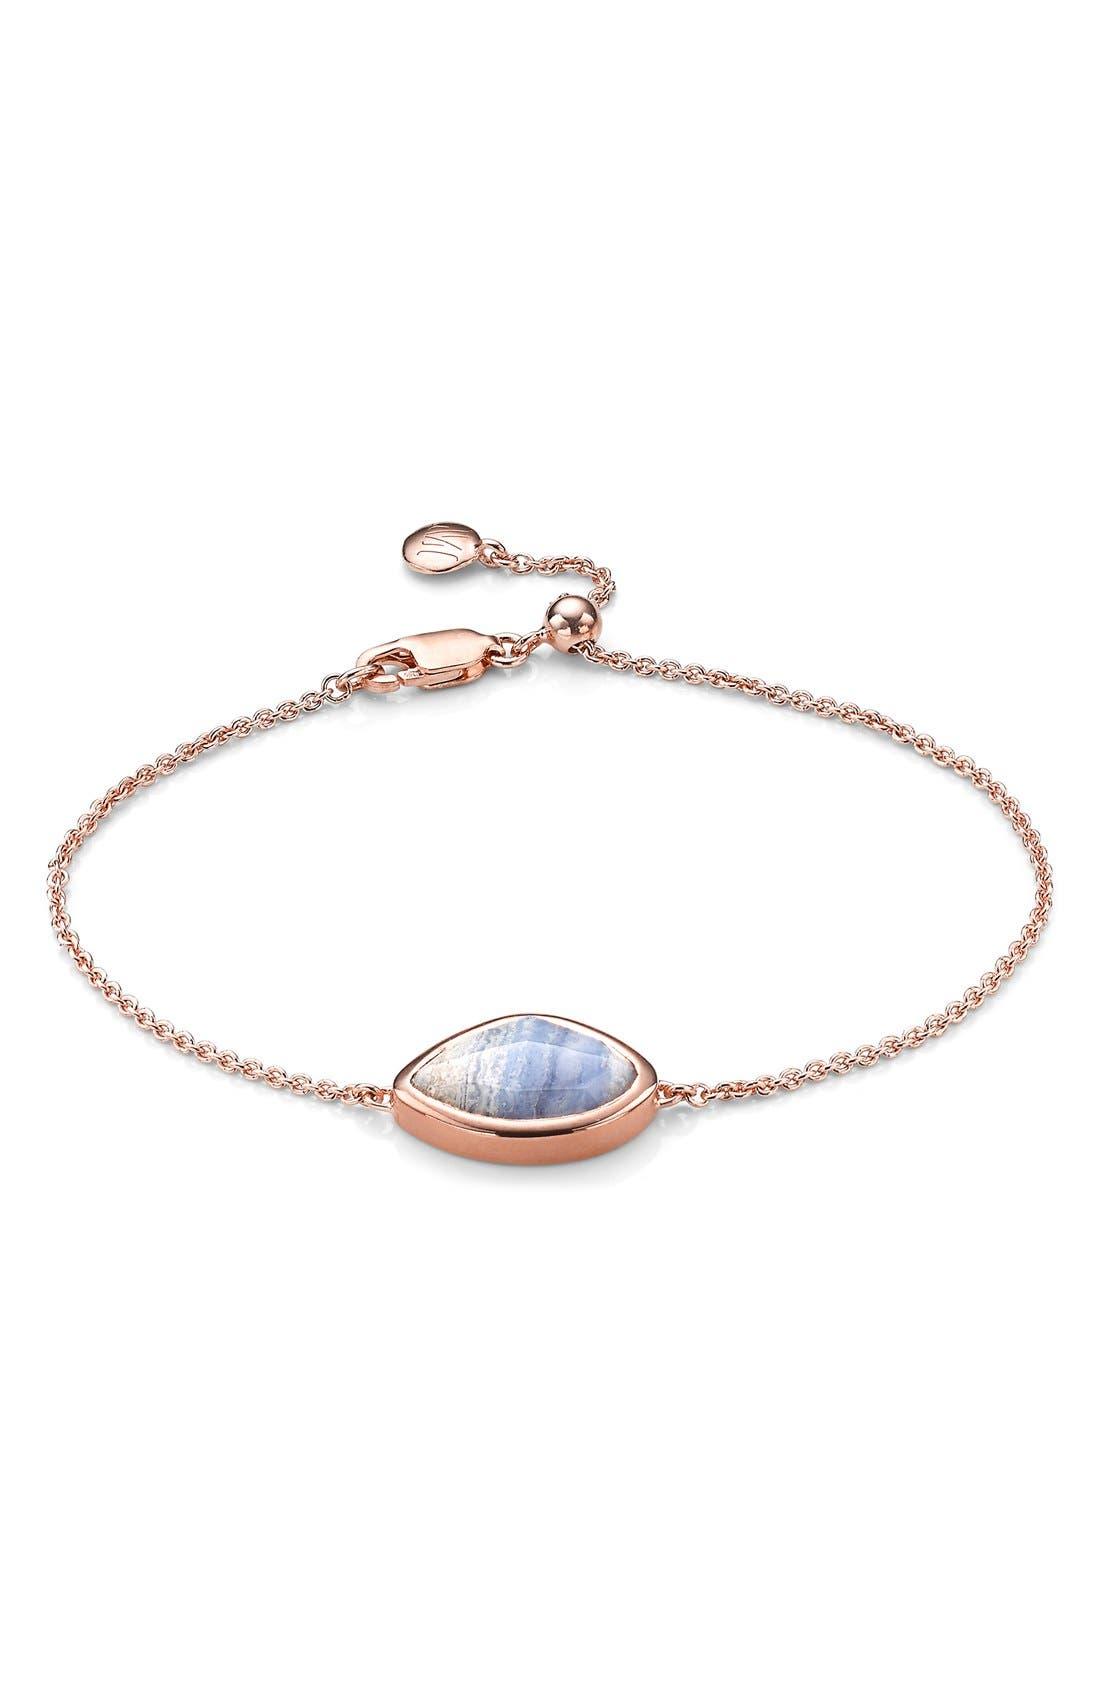 Monica Vinader 'Siren' Teardrop Bracelet